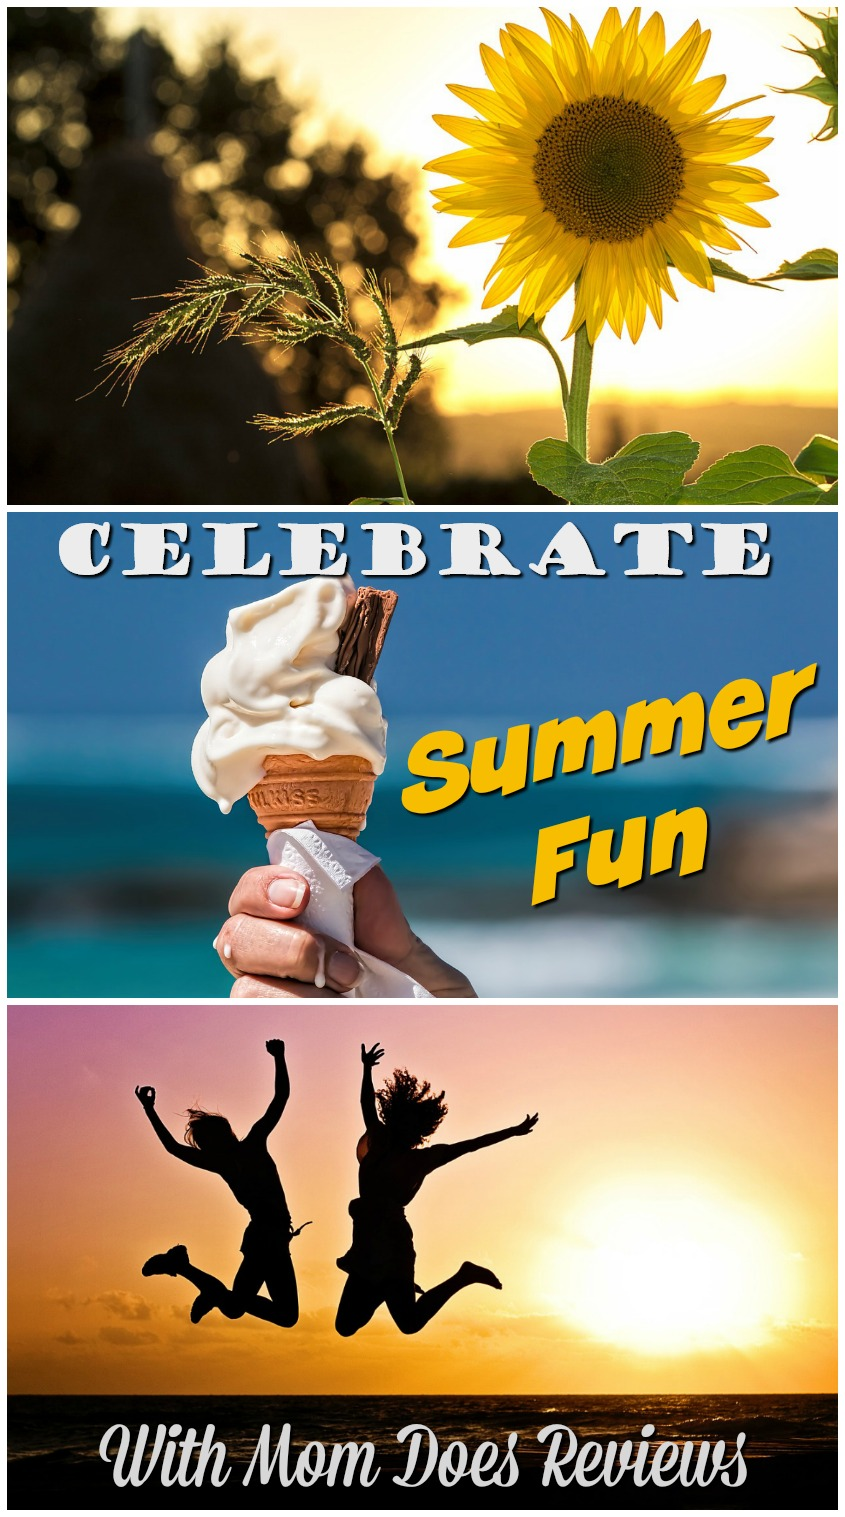 Celebrate Summer Fun 2019 #MDRsummerFun #gifts #giftguide #giftideas #summer